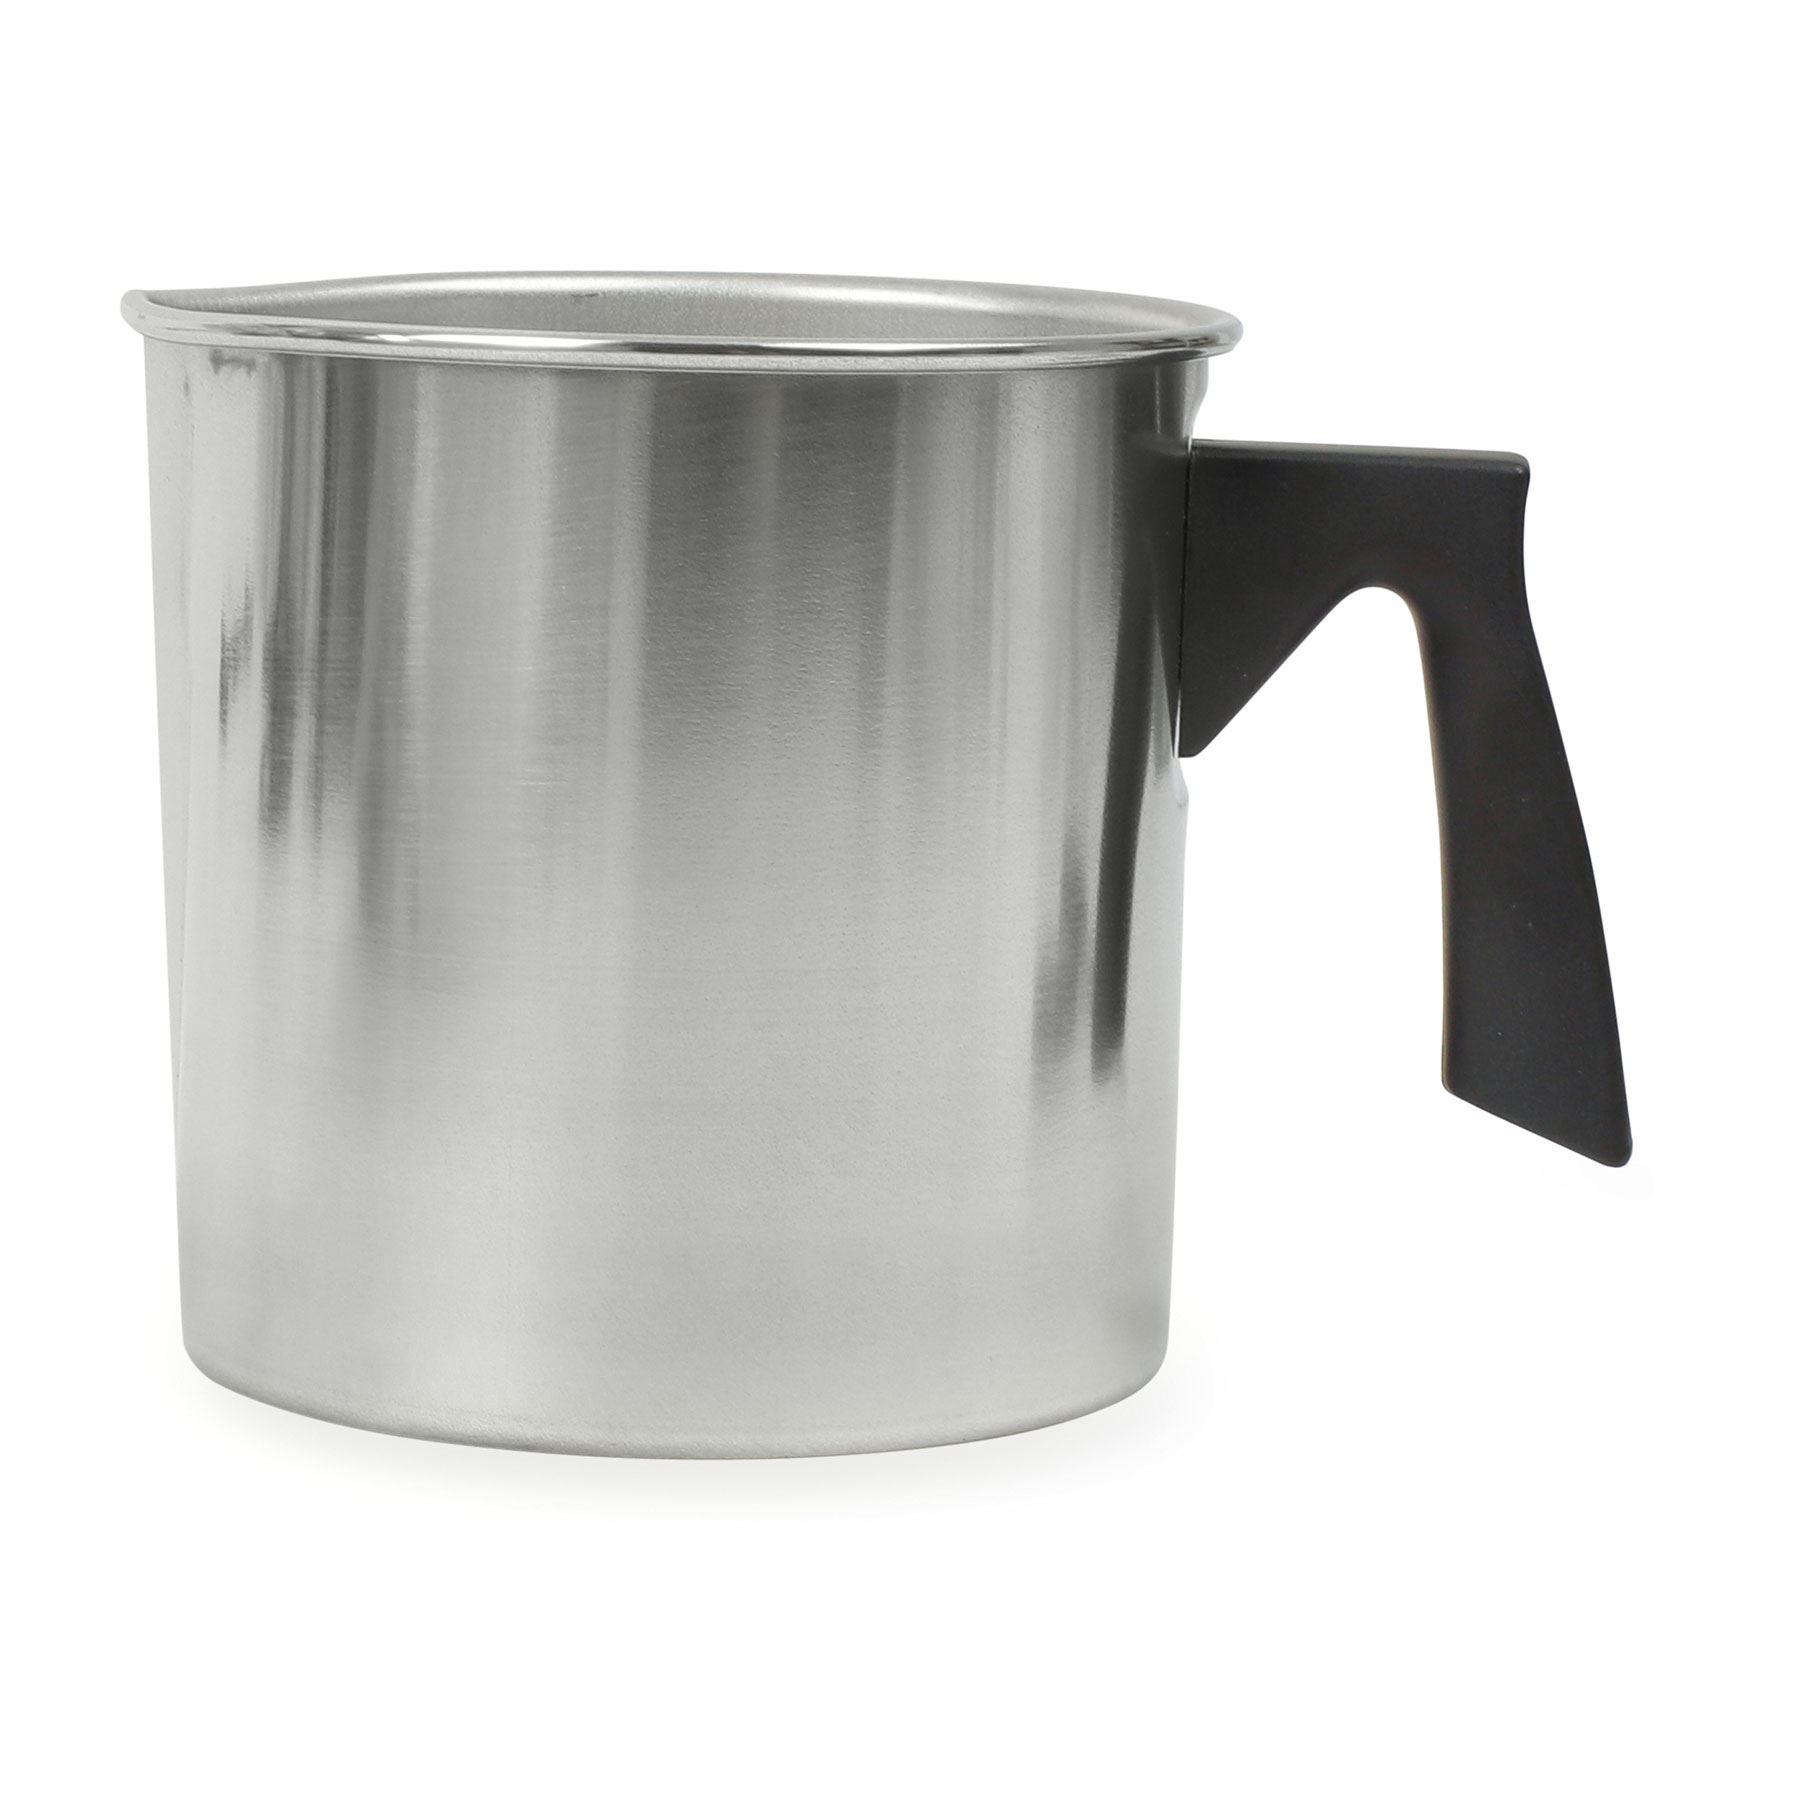 Your-Crafts-Candle-Makers-Wax-Melting-Pitcher-amp-Tools-Aluminium-Pot thumbnail 10